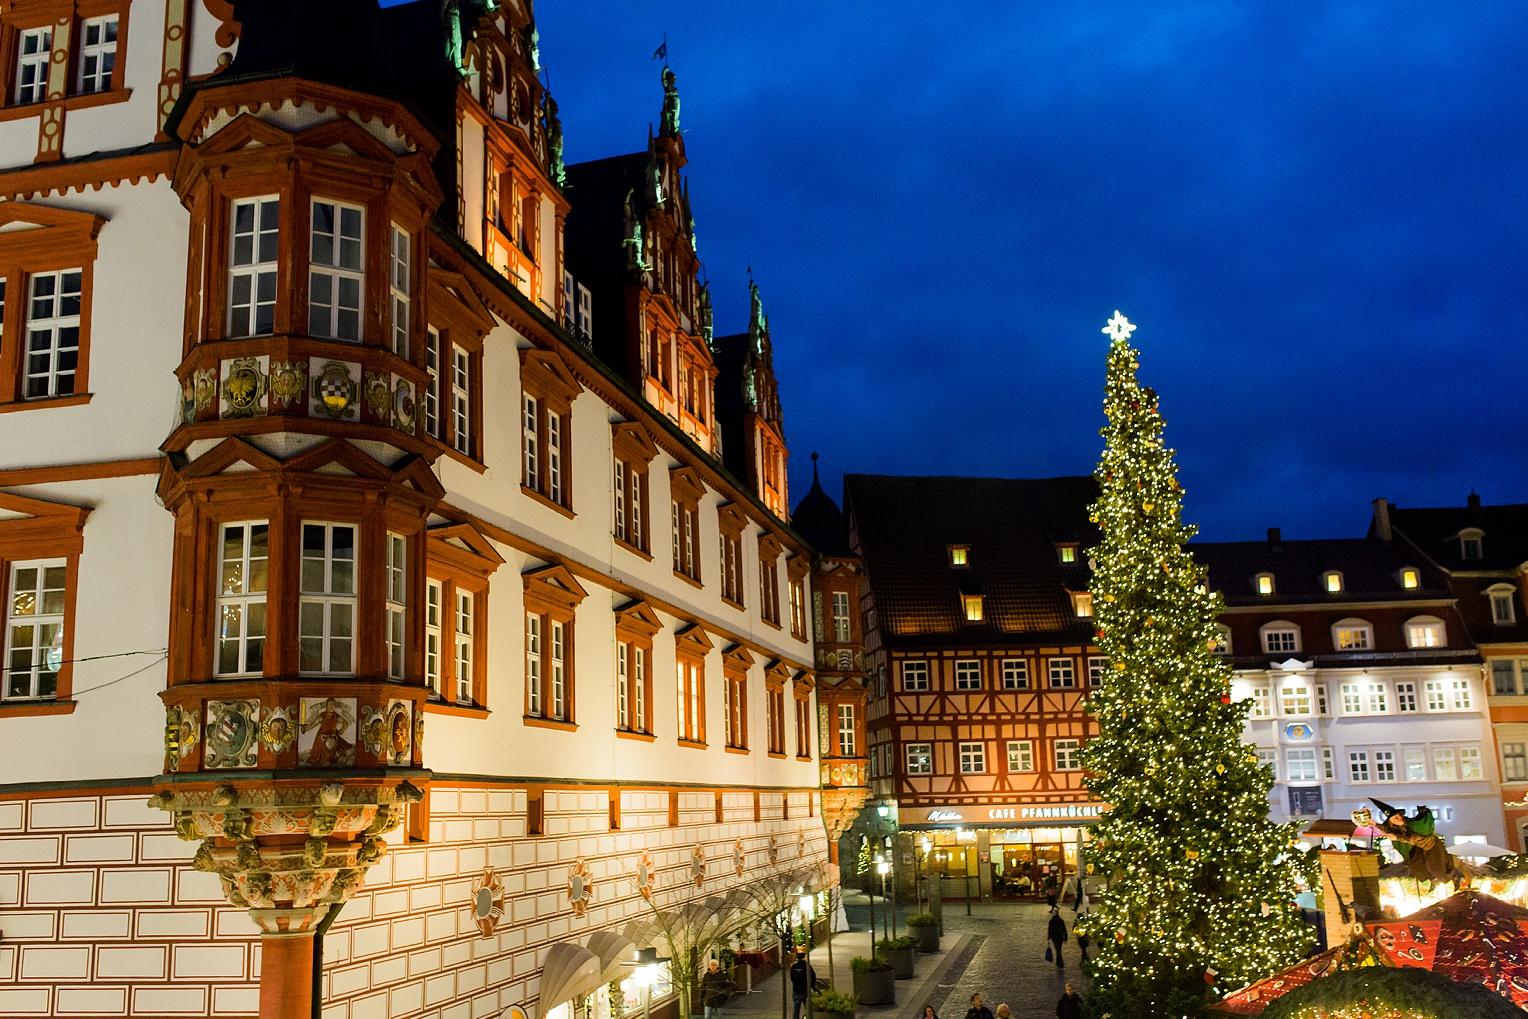 Sonnefeld Coburg Germany Christmas Market